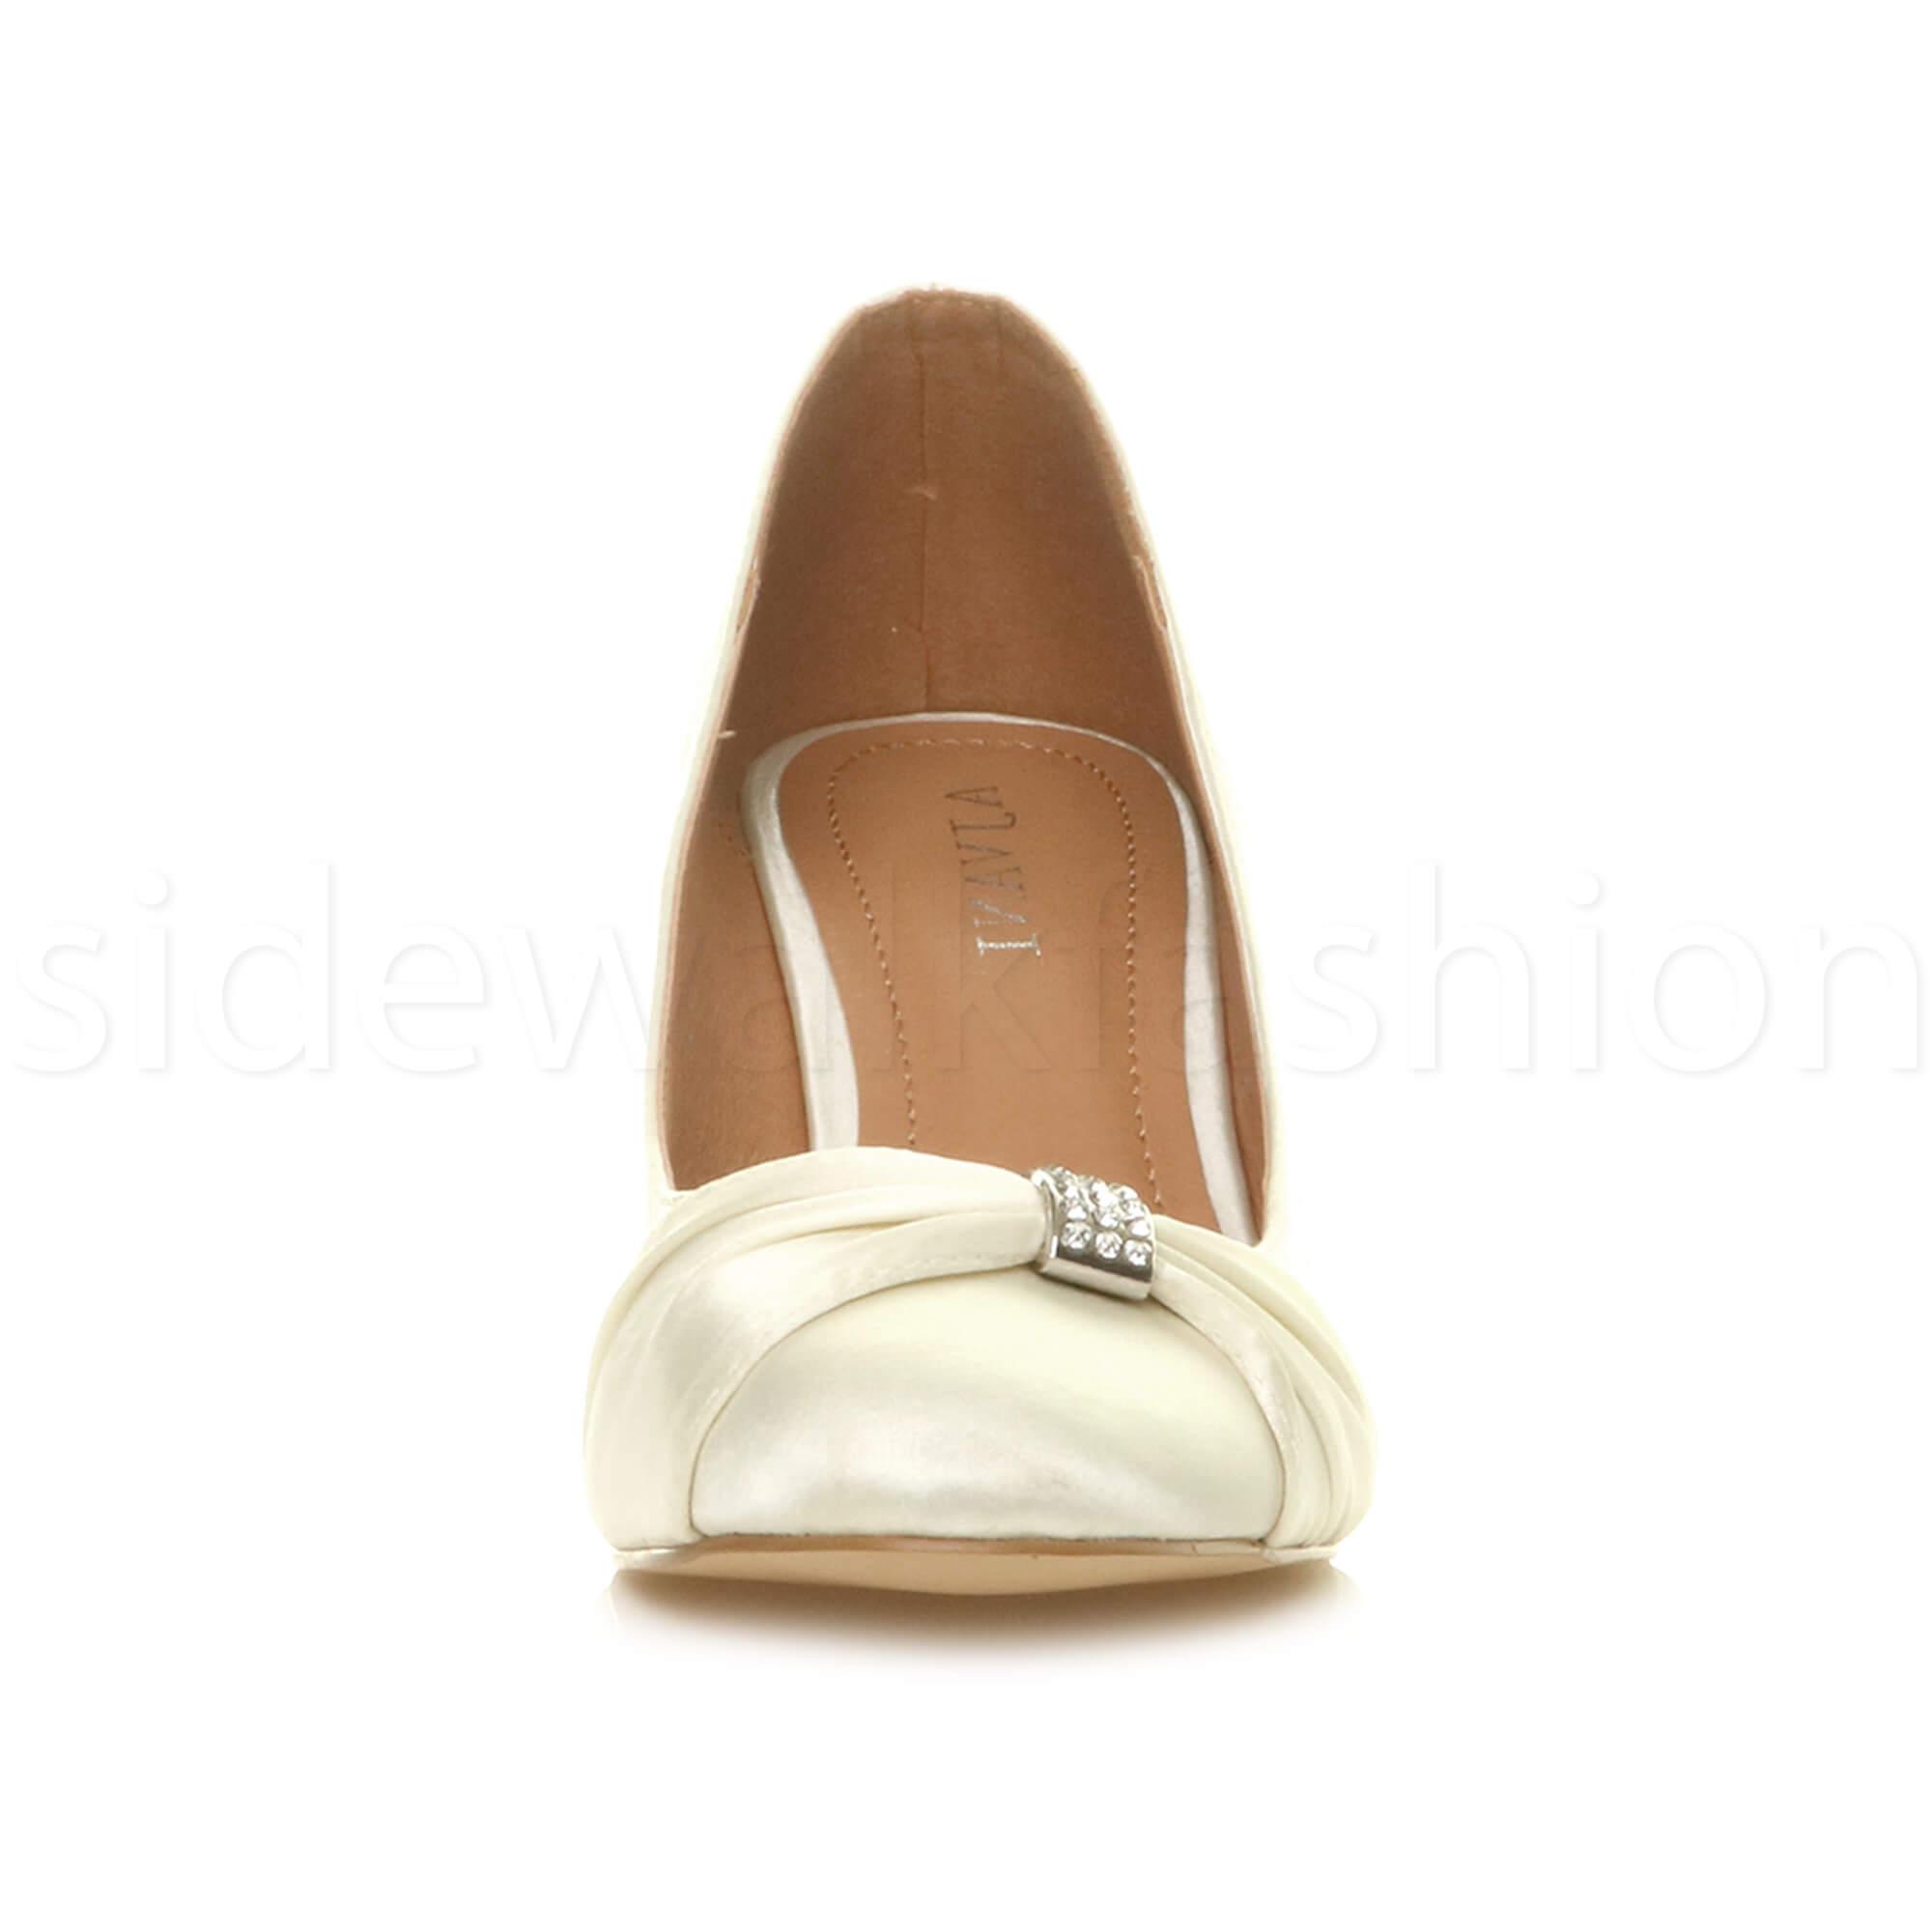 Womens-ladies-low-mid-heel-diamante-party-smart-evening-court-shoes-size thumbnail 39